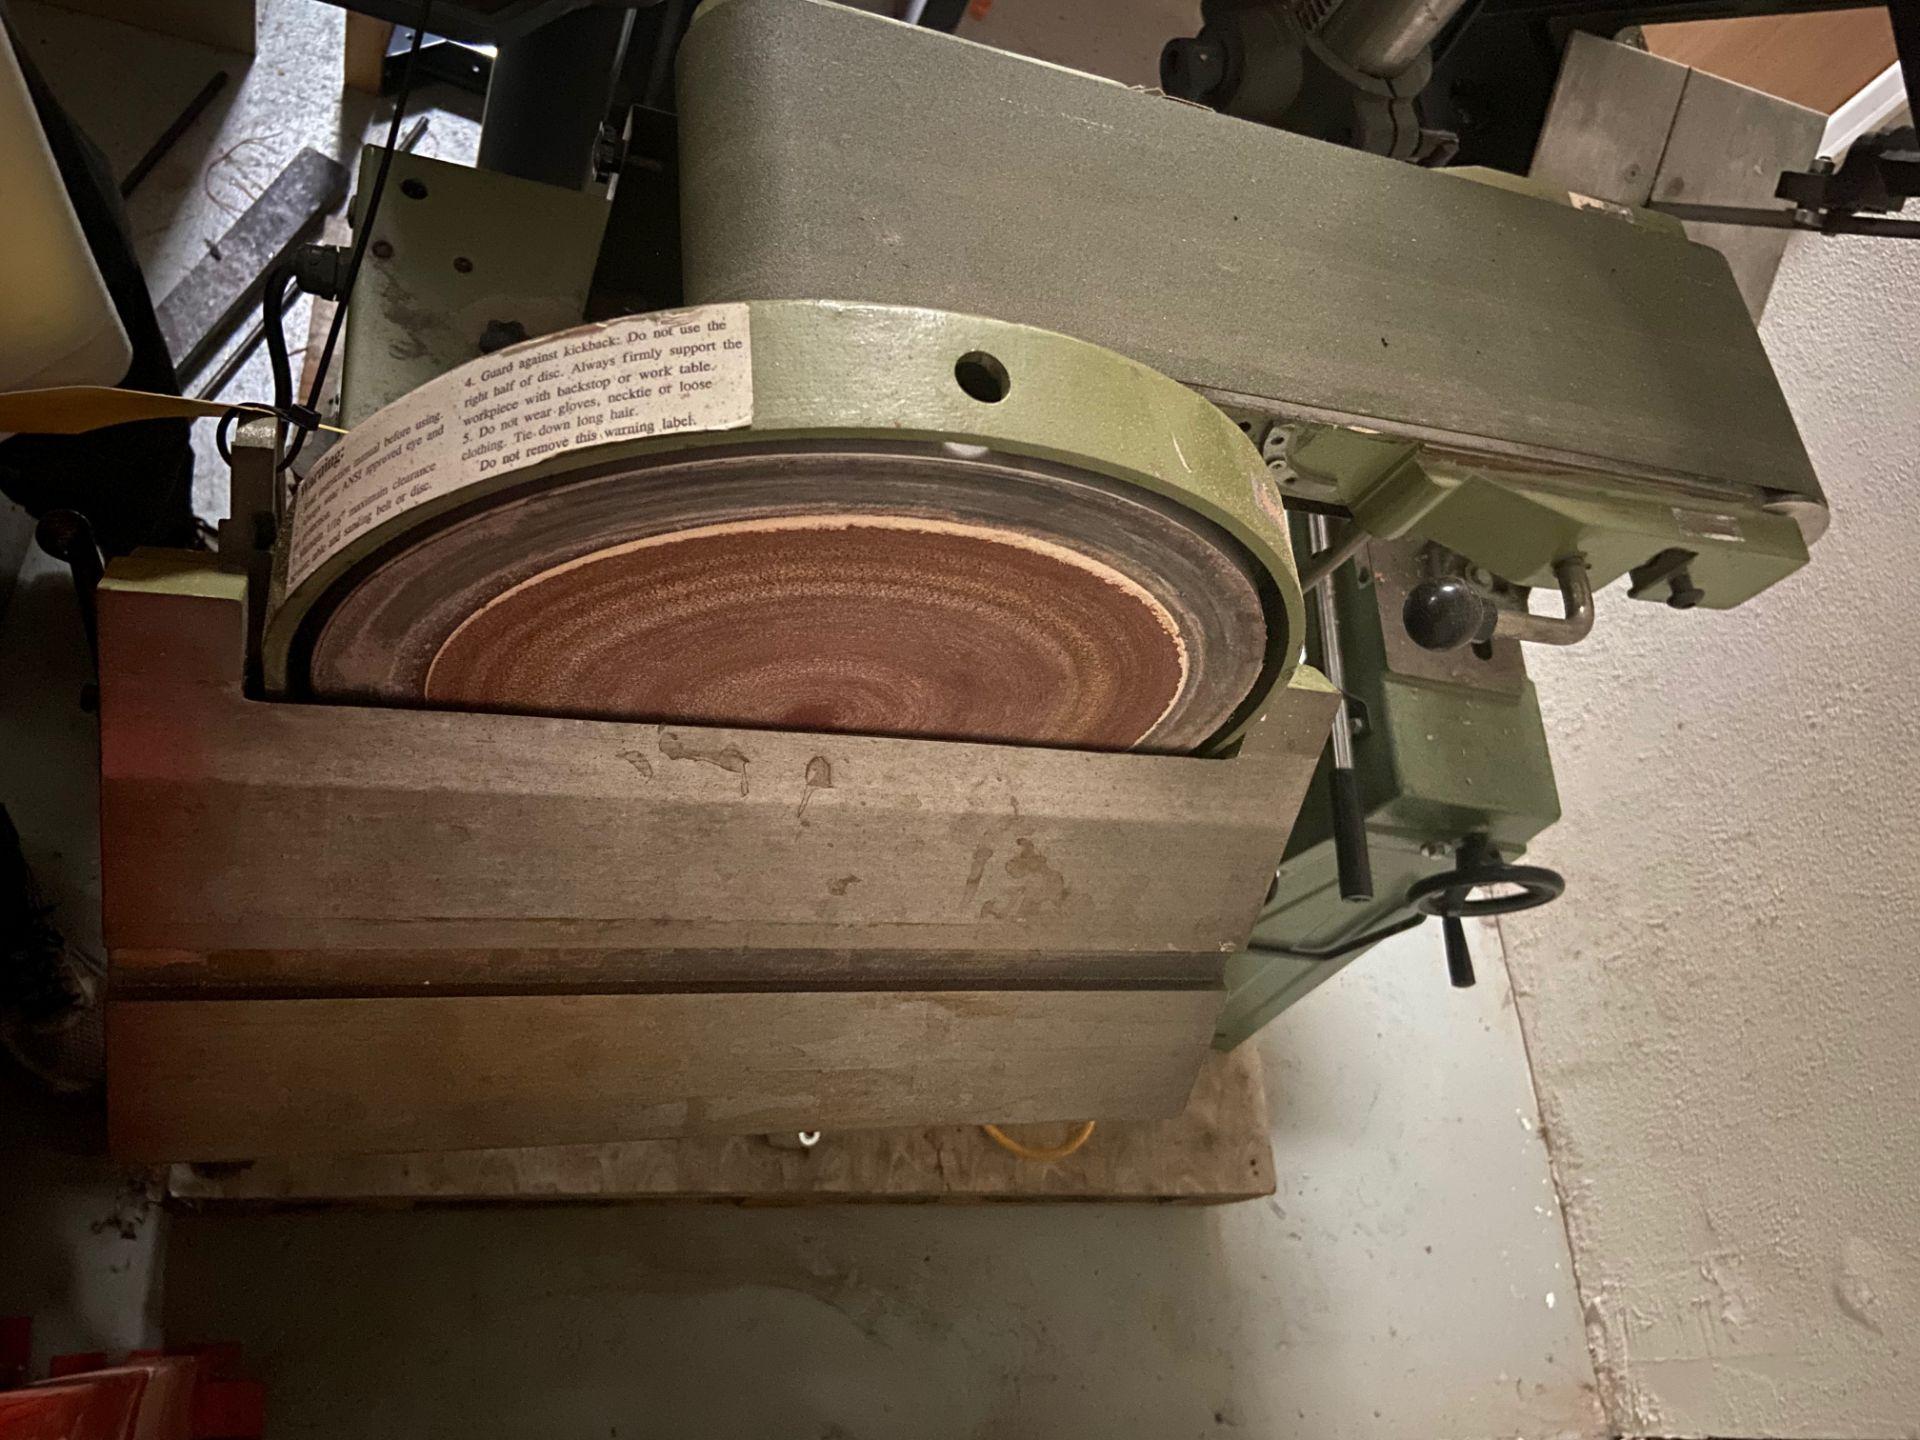 Belt and Disc Sander, Loading/Removal Fee: $25 - Image 4 of 5